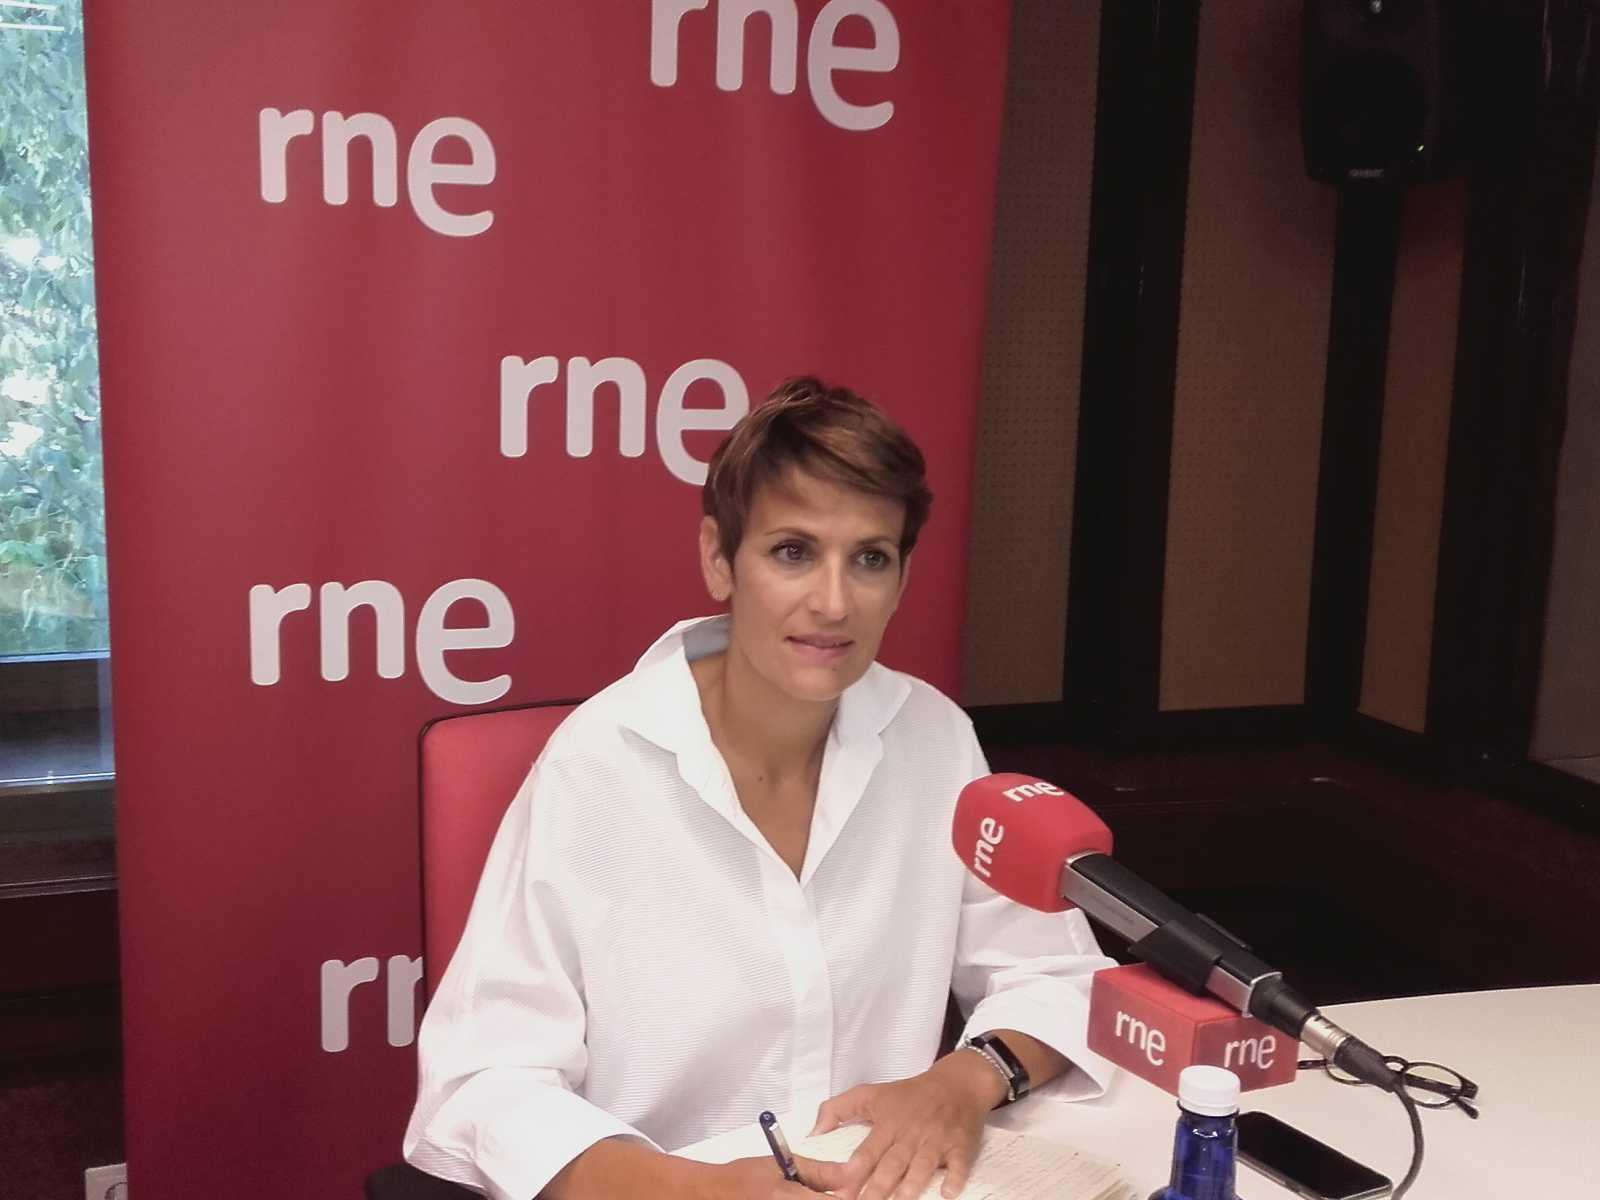 Entrevista - María Chivite / PSN - 25/09/18 - Escuchar ahora